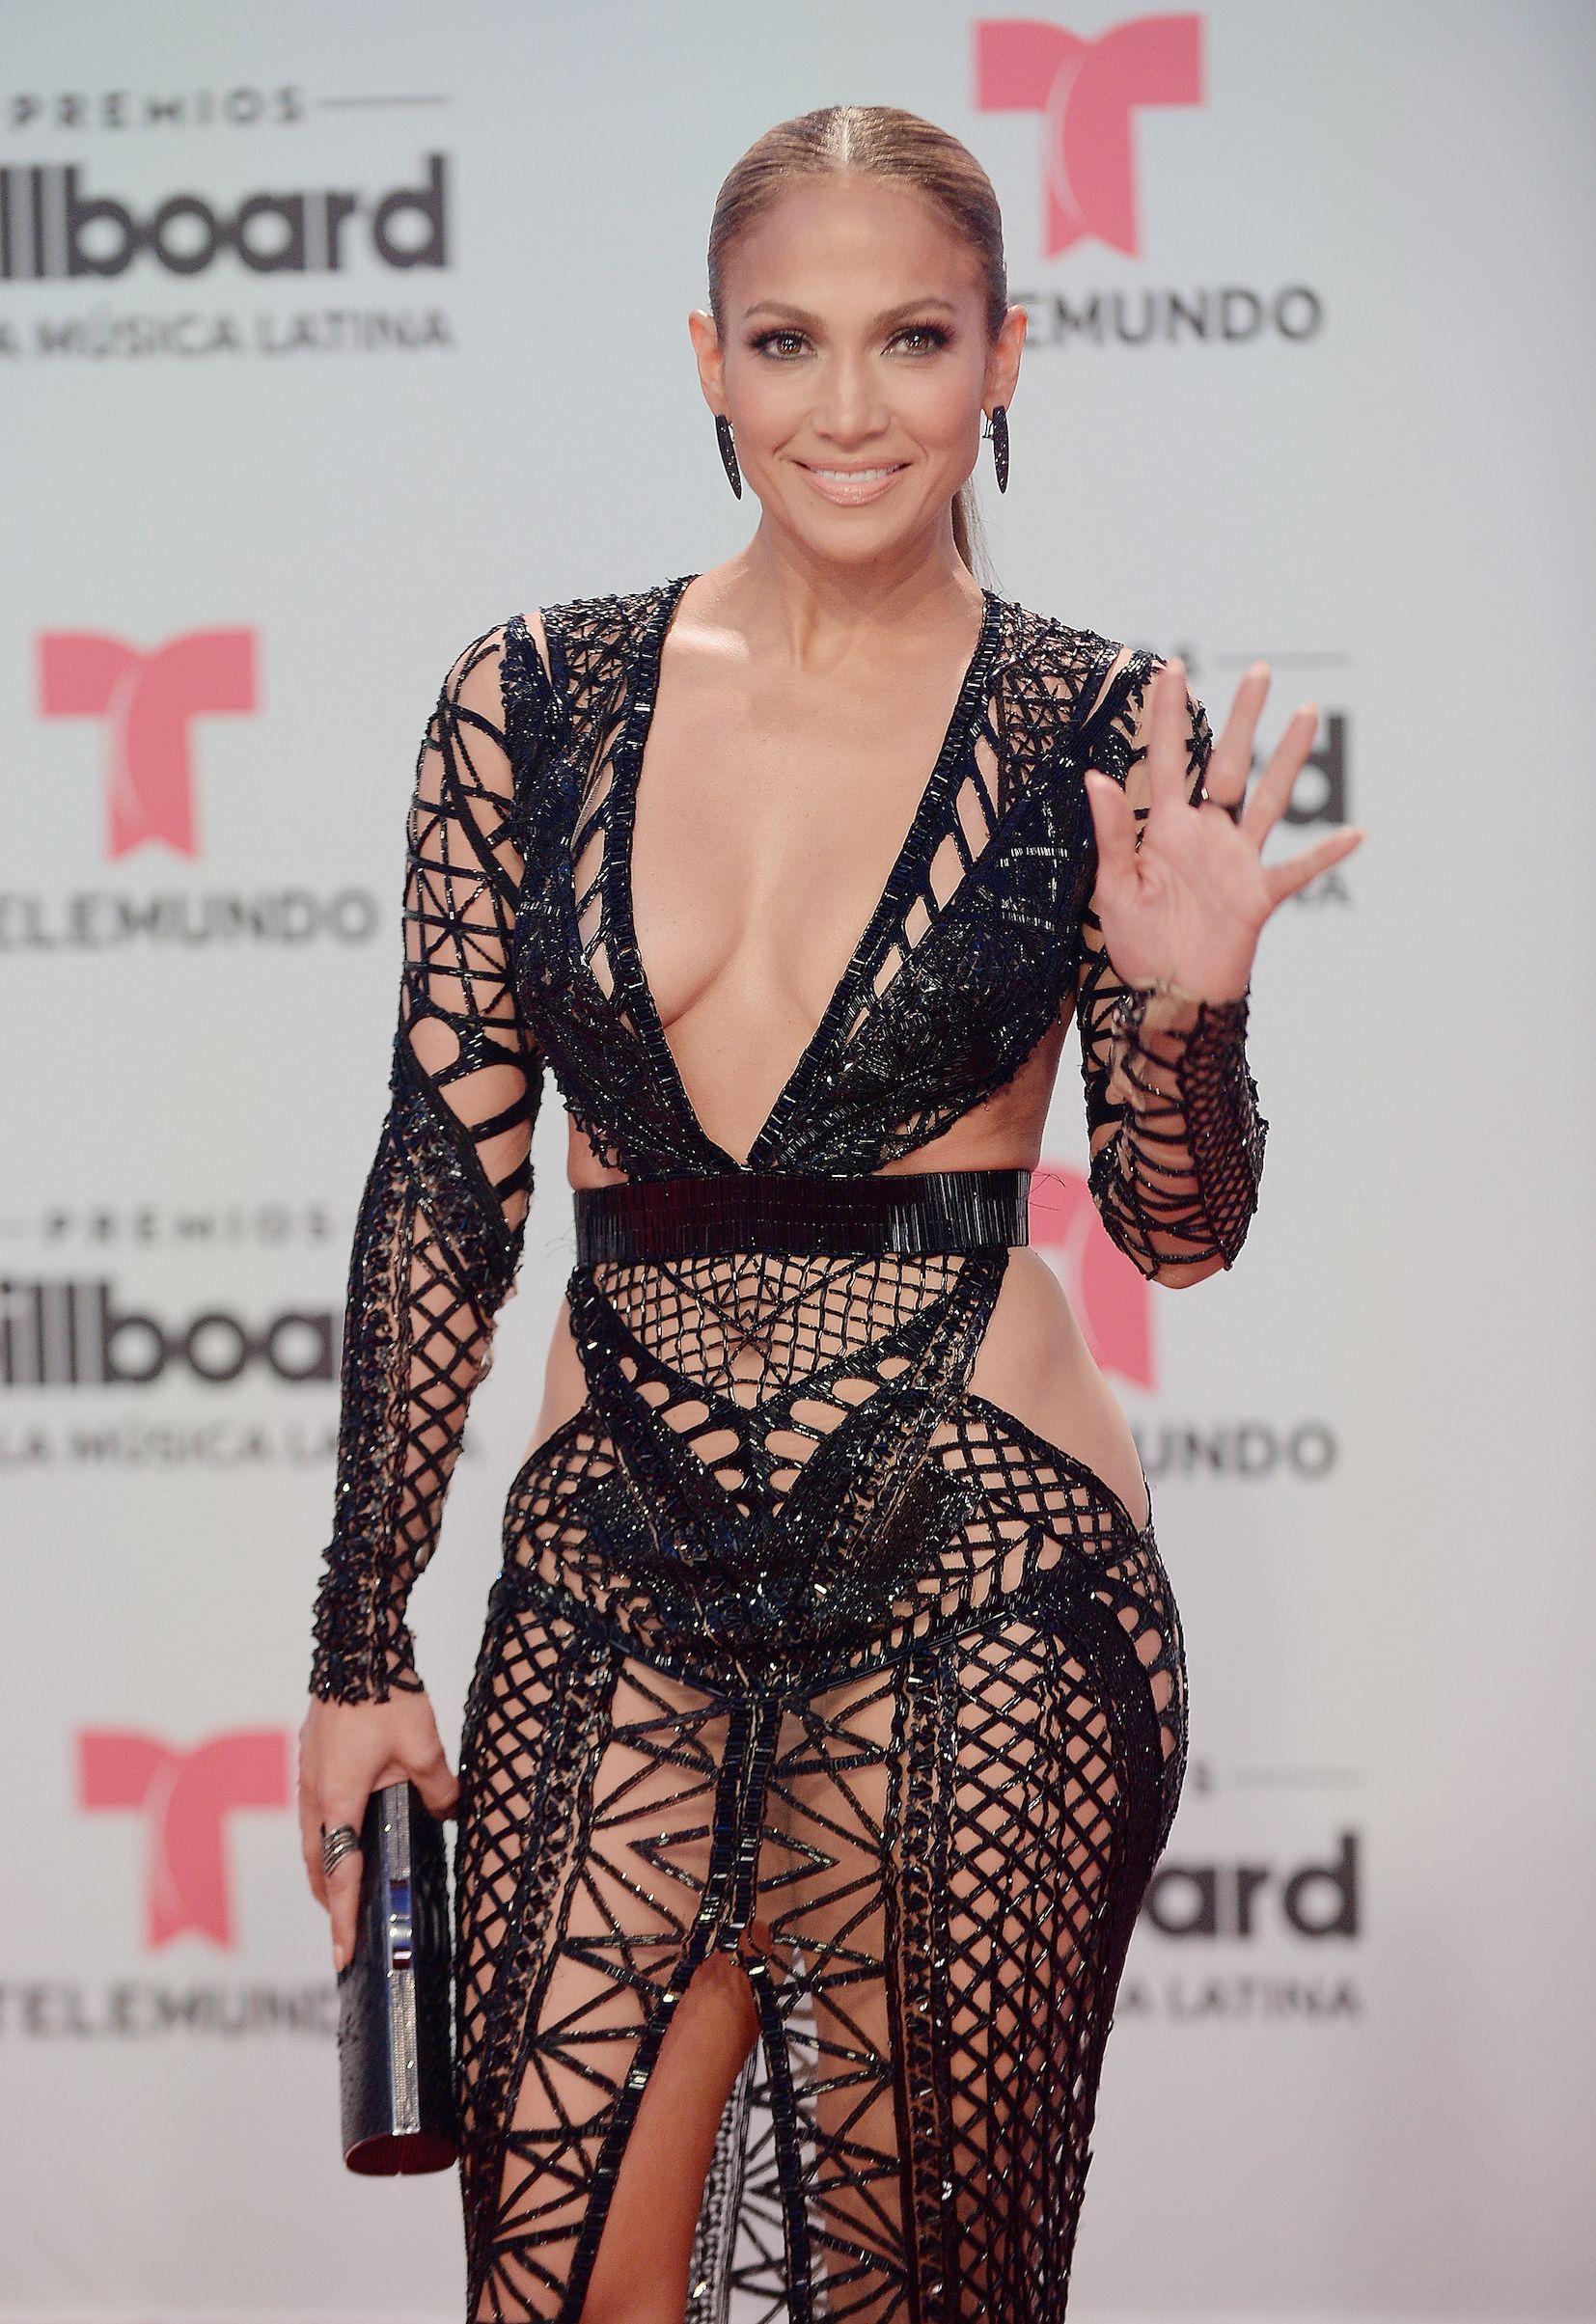 Hustlers star Jennifer Lopez jokes about the movie's surprise cameo